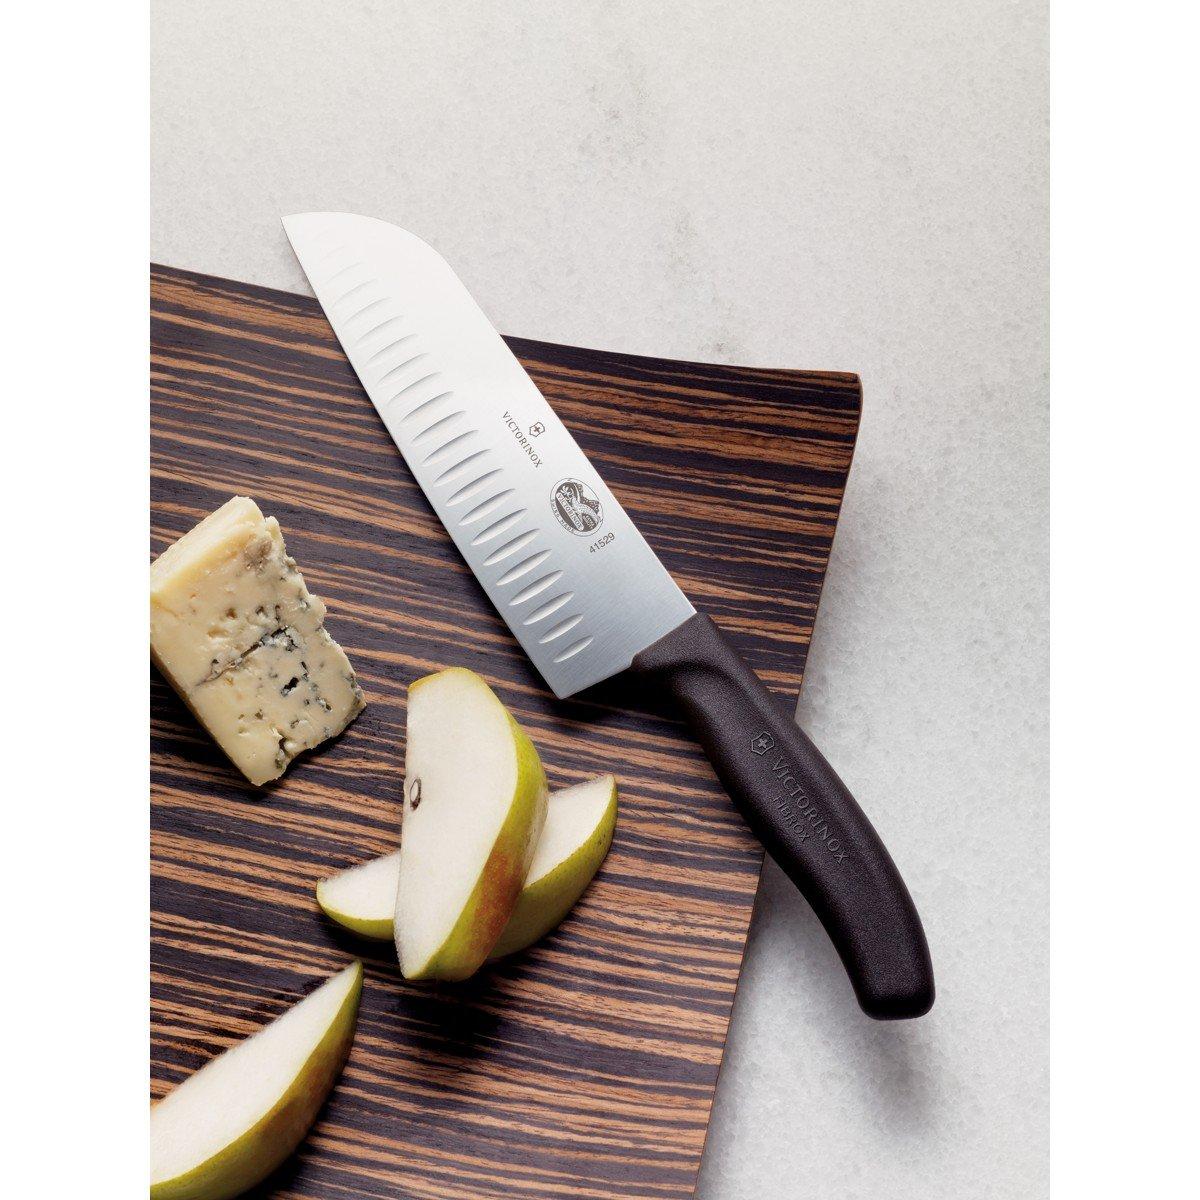 Victorinox Fibrox 7-Inch Granton Edge Santoku Knife Review